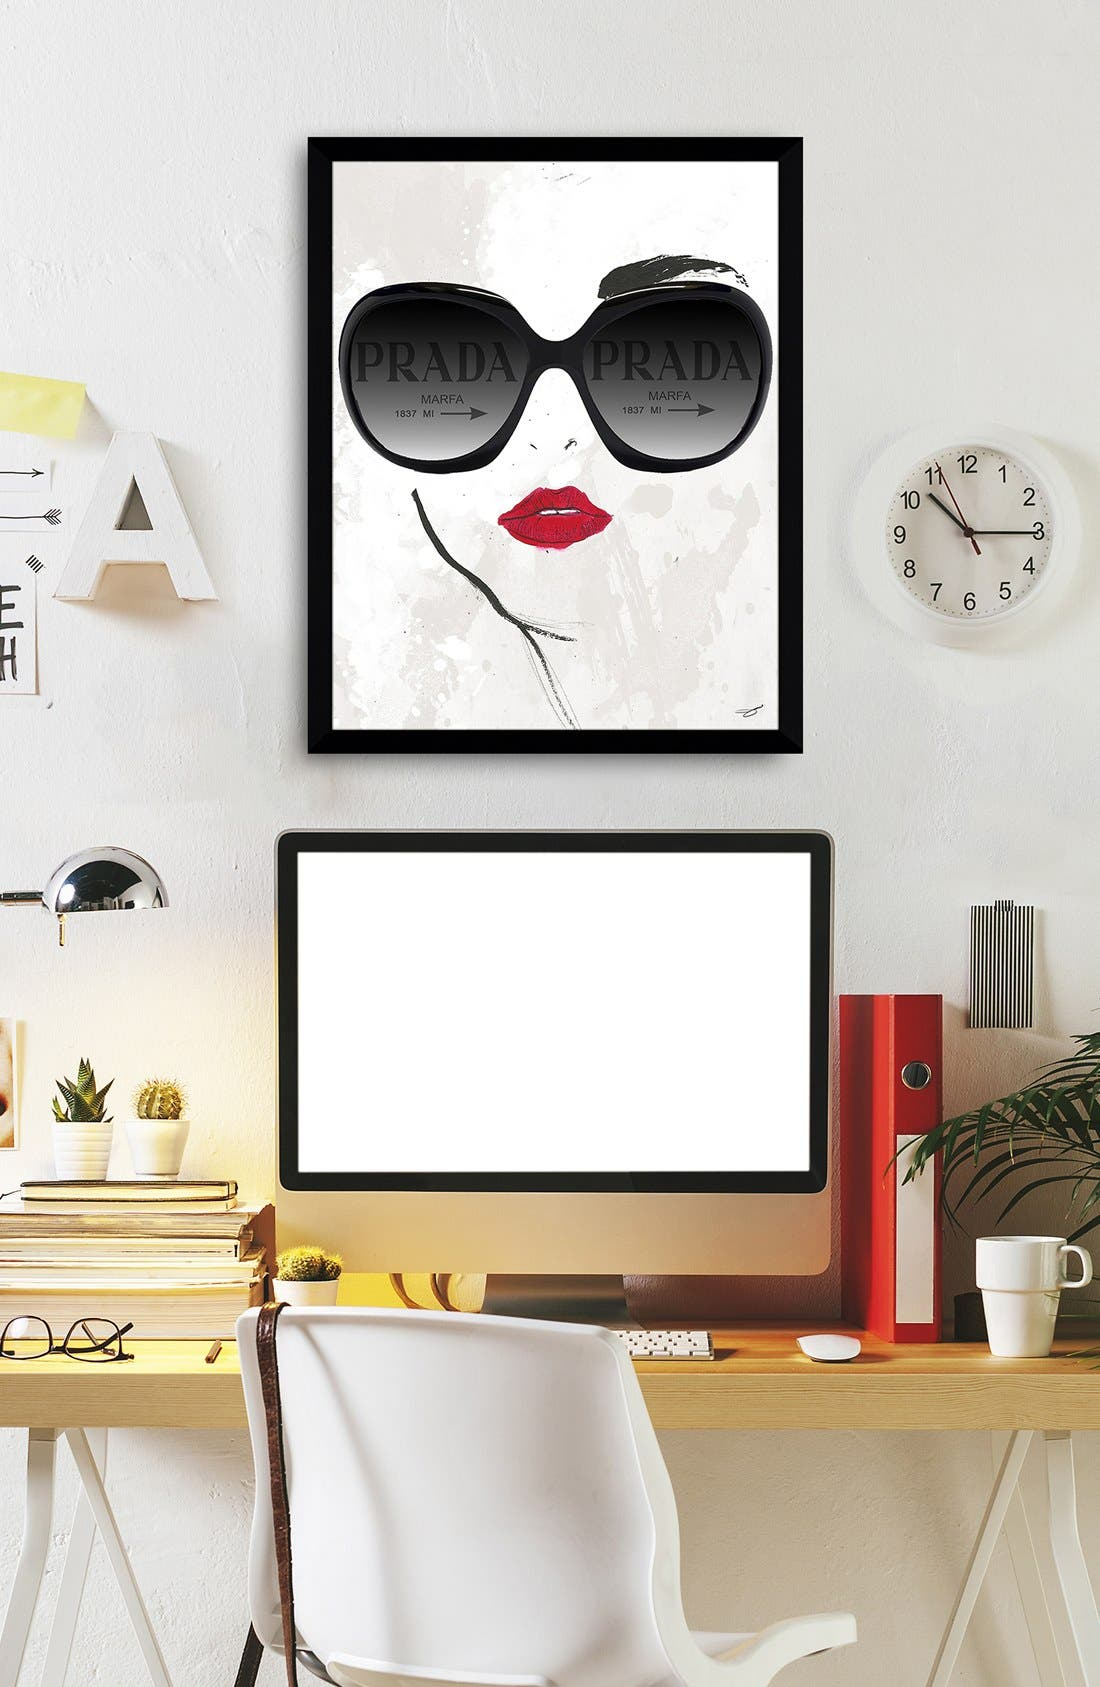 Alternate Image 3  - Picture Perfect 'Prada Sunnies' Fine Art Print